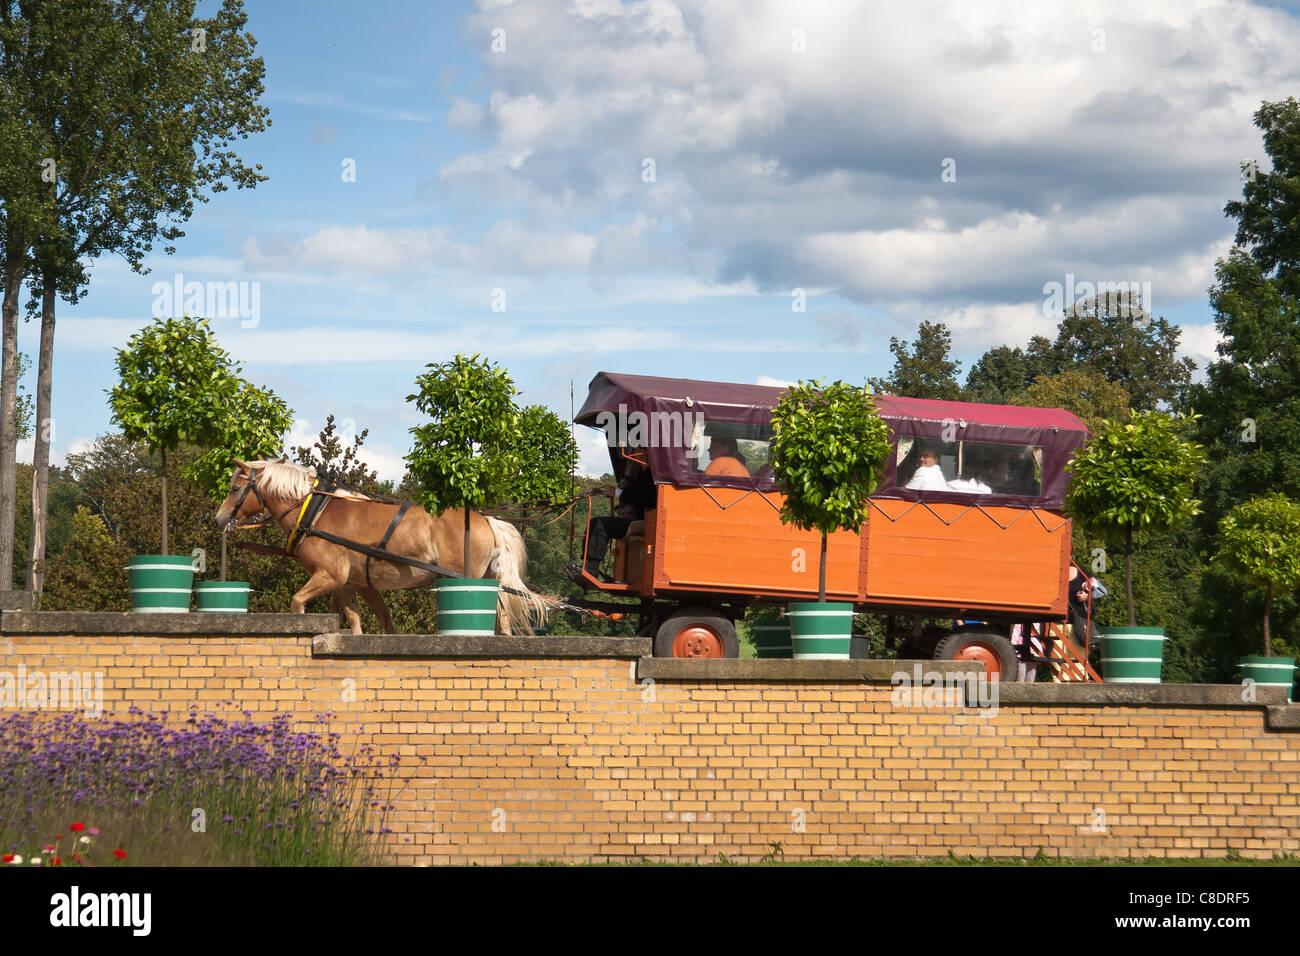 Hackney carriage, Bad Muskau, Germany. - Stock Image